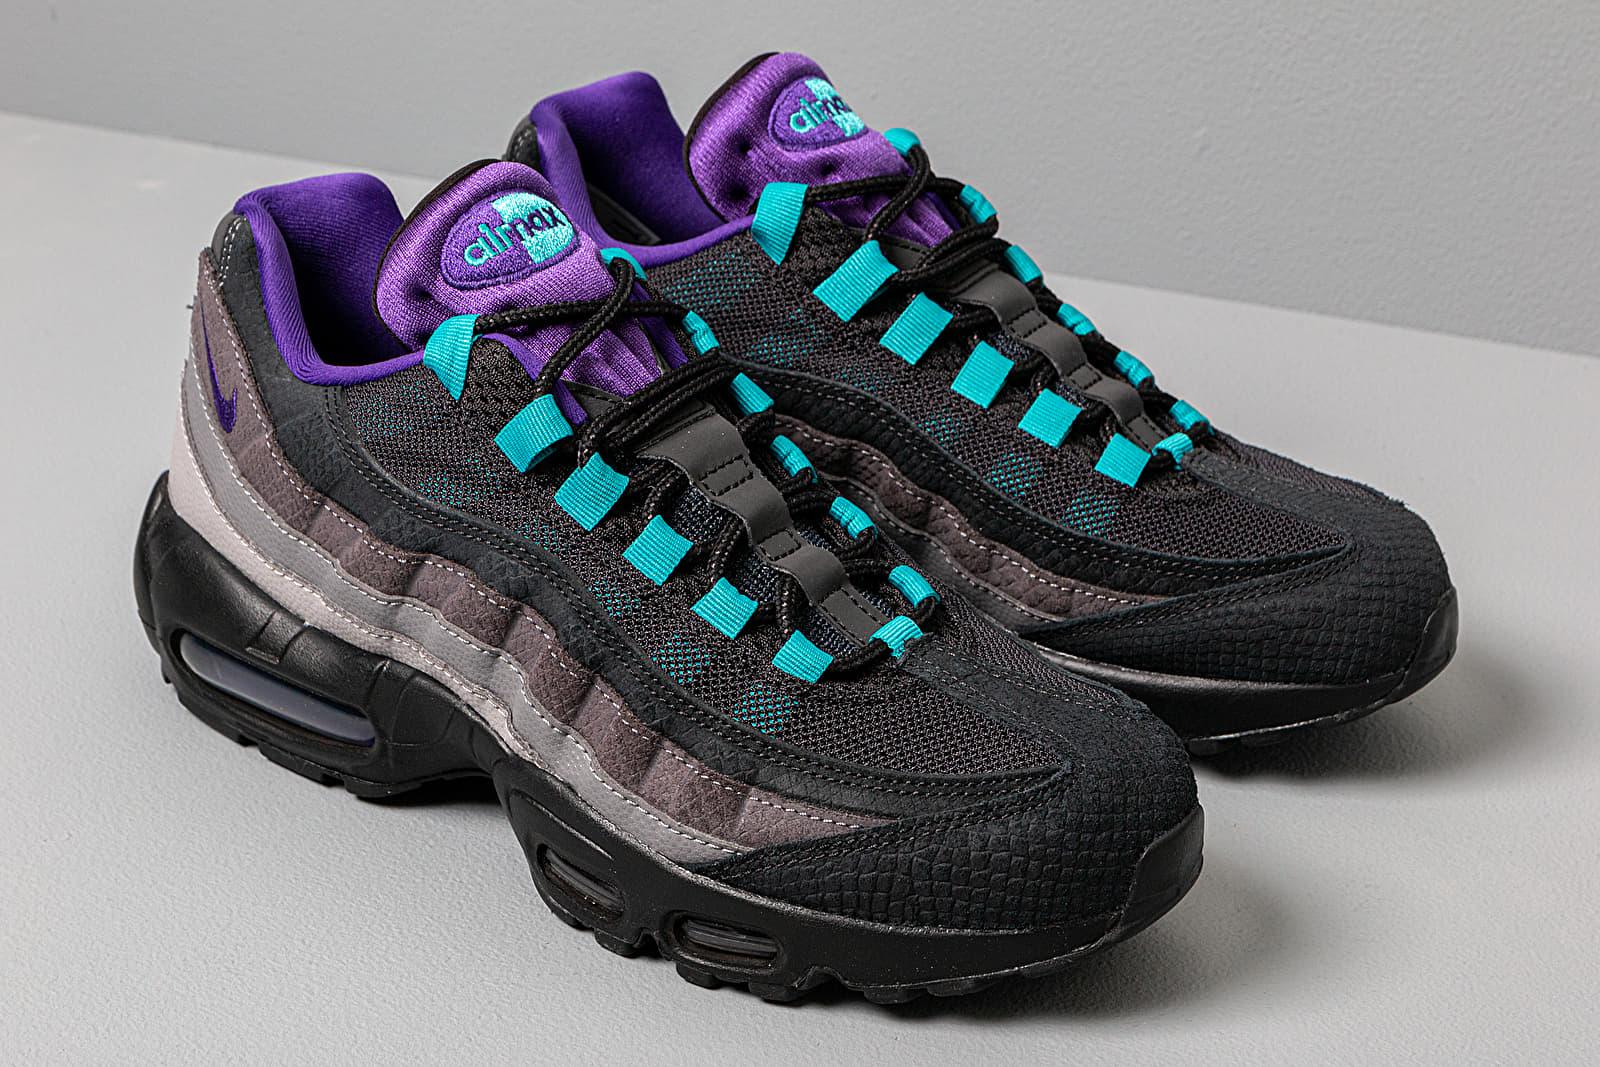 Nike Air Max 95 Lv8 Uomo Wolf Grey Purple